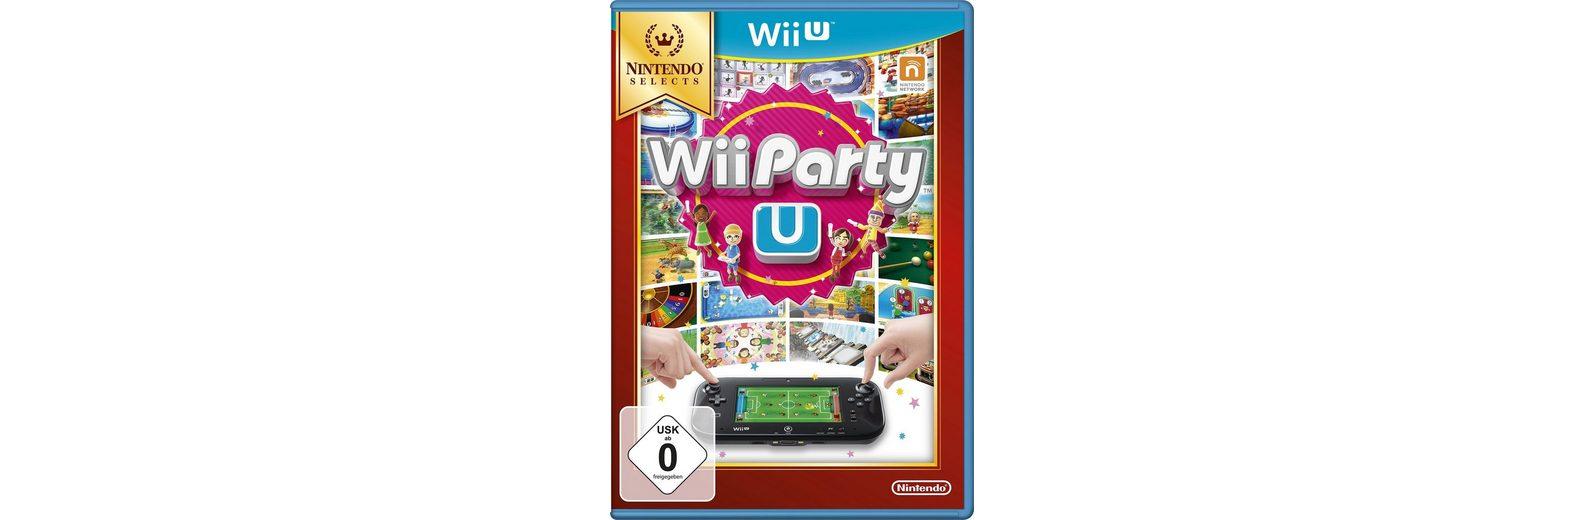 Wii Party U Nintendo Selects Wii U